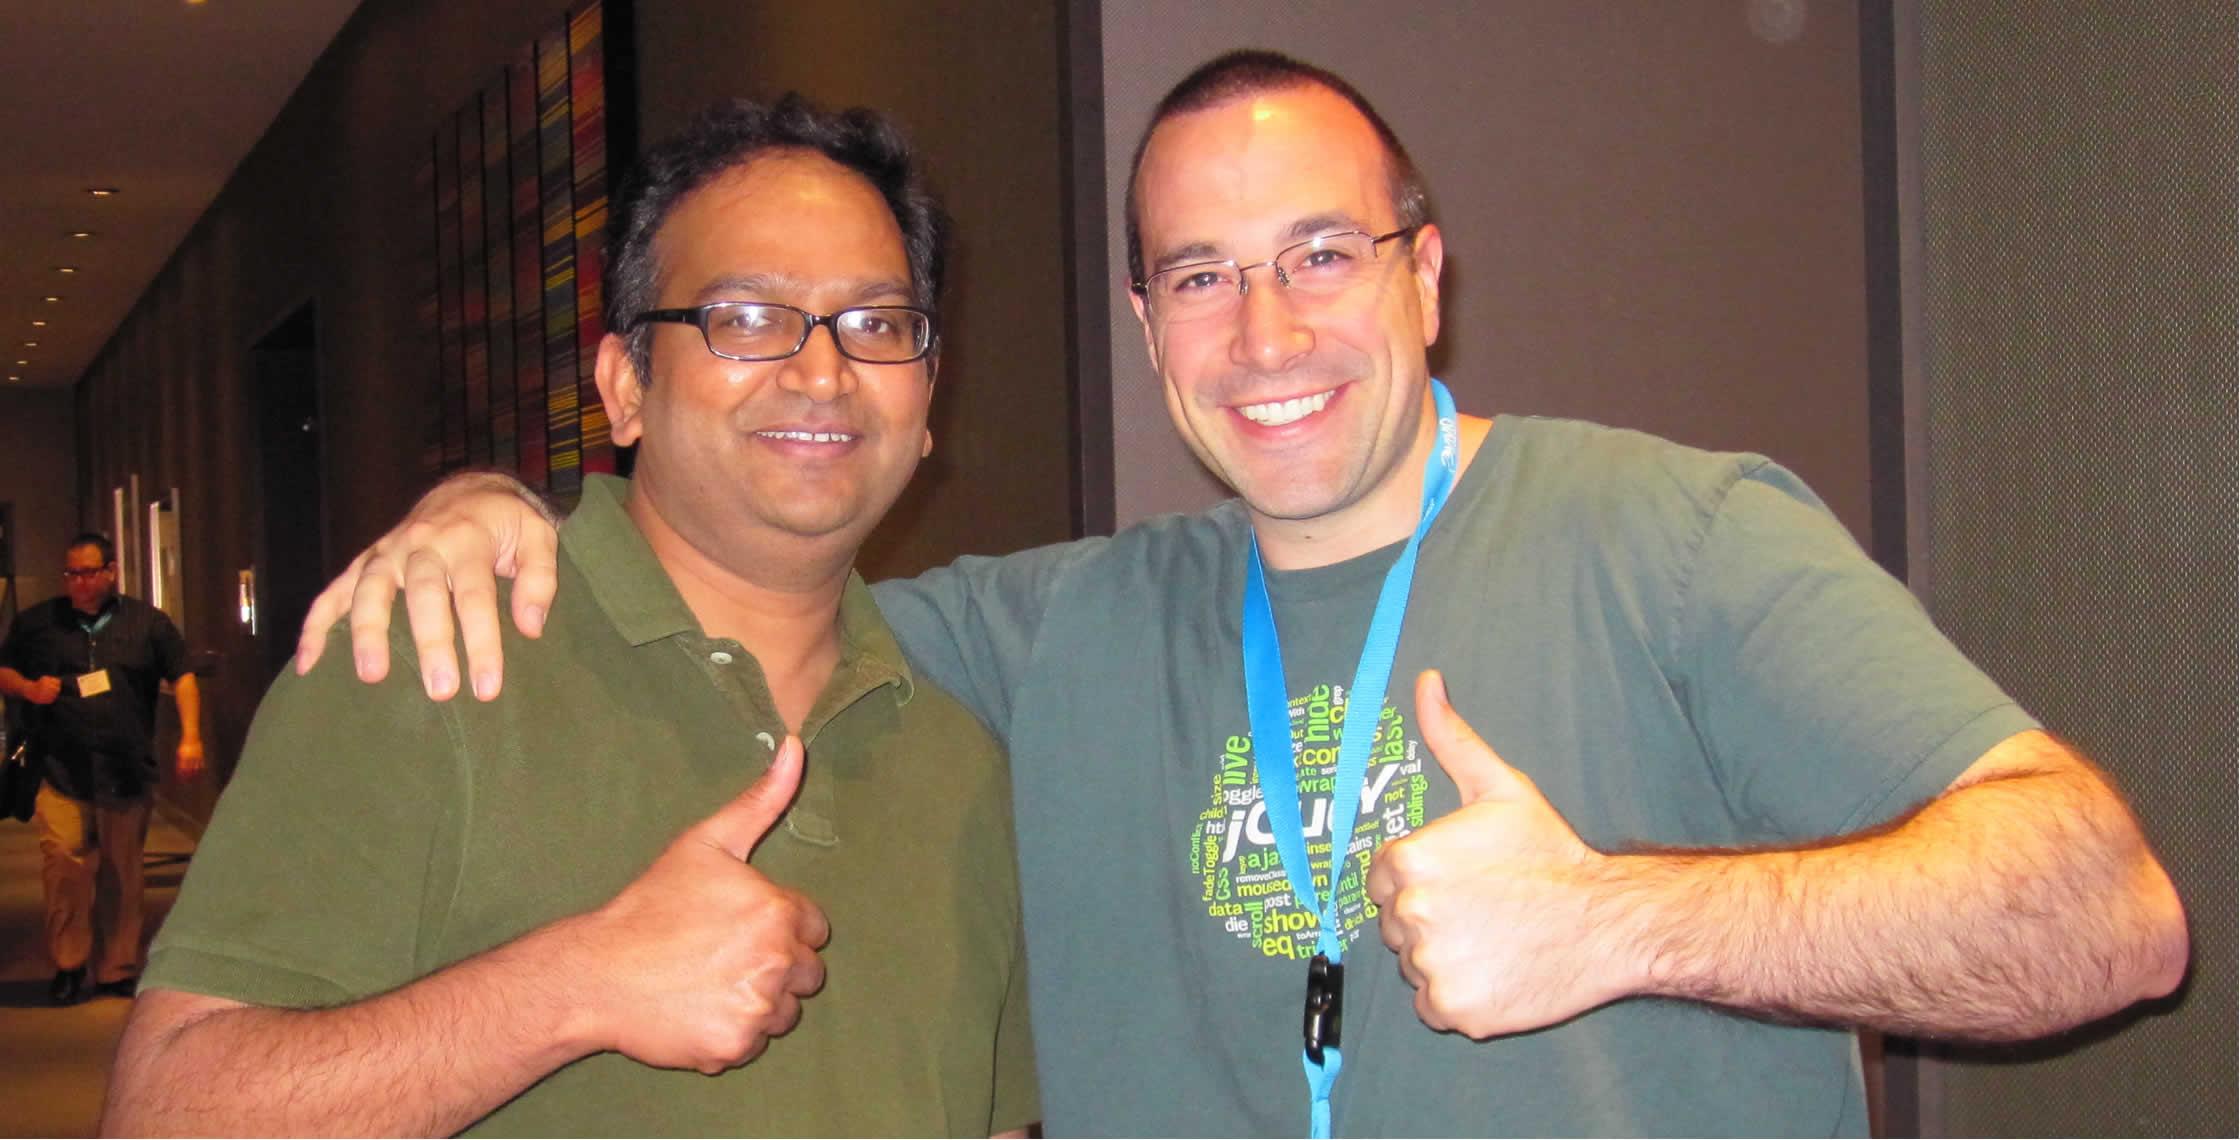 Ben Nadel at cf.Objective() 2013 (Bloomington, MN) with: Sunil Mendu